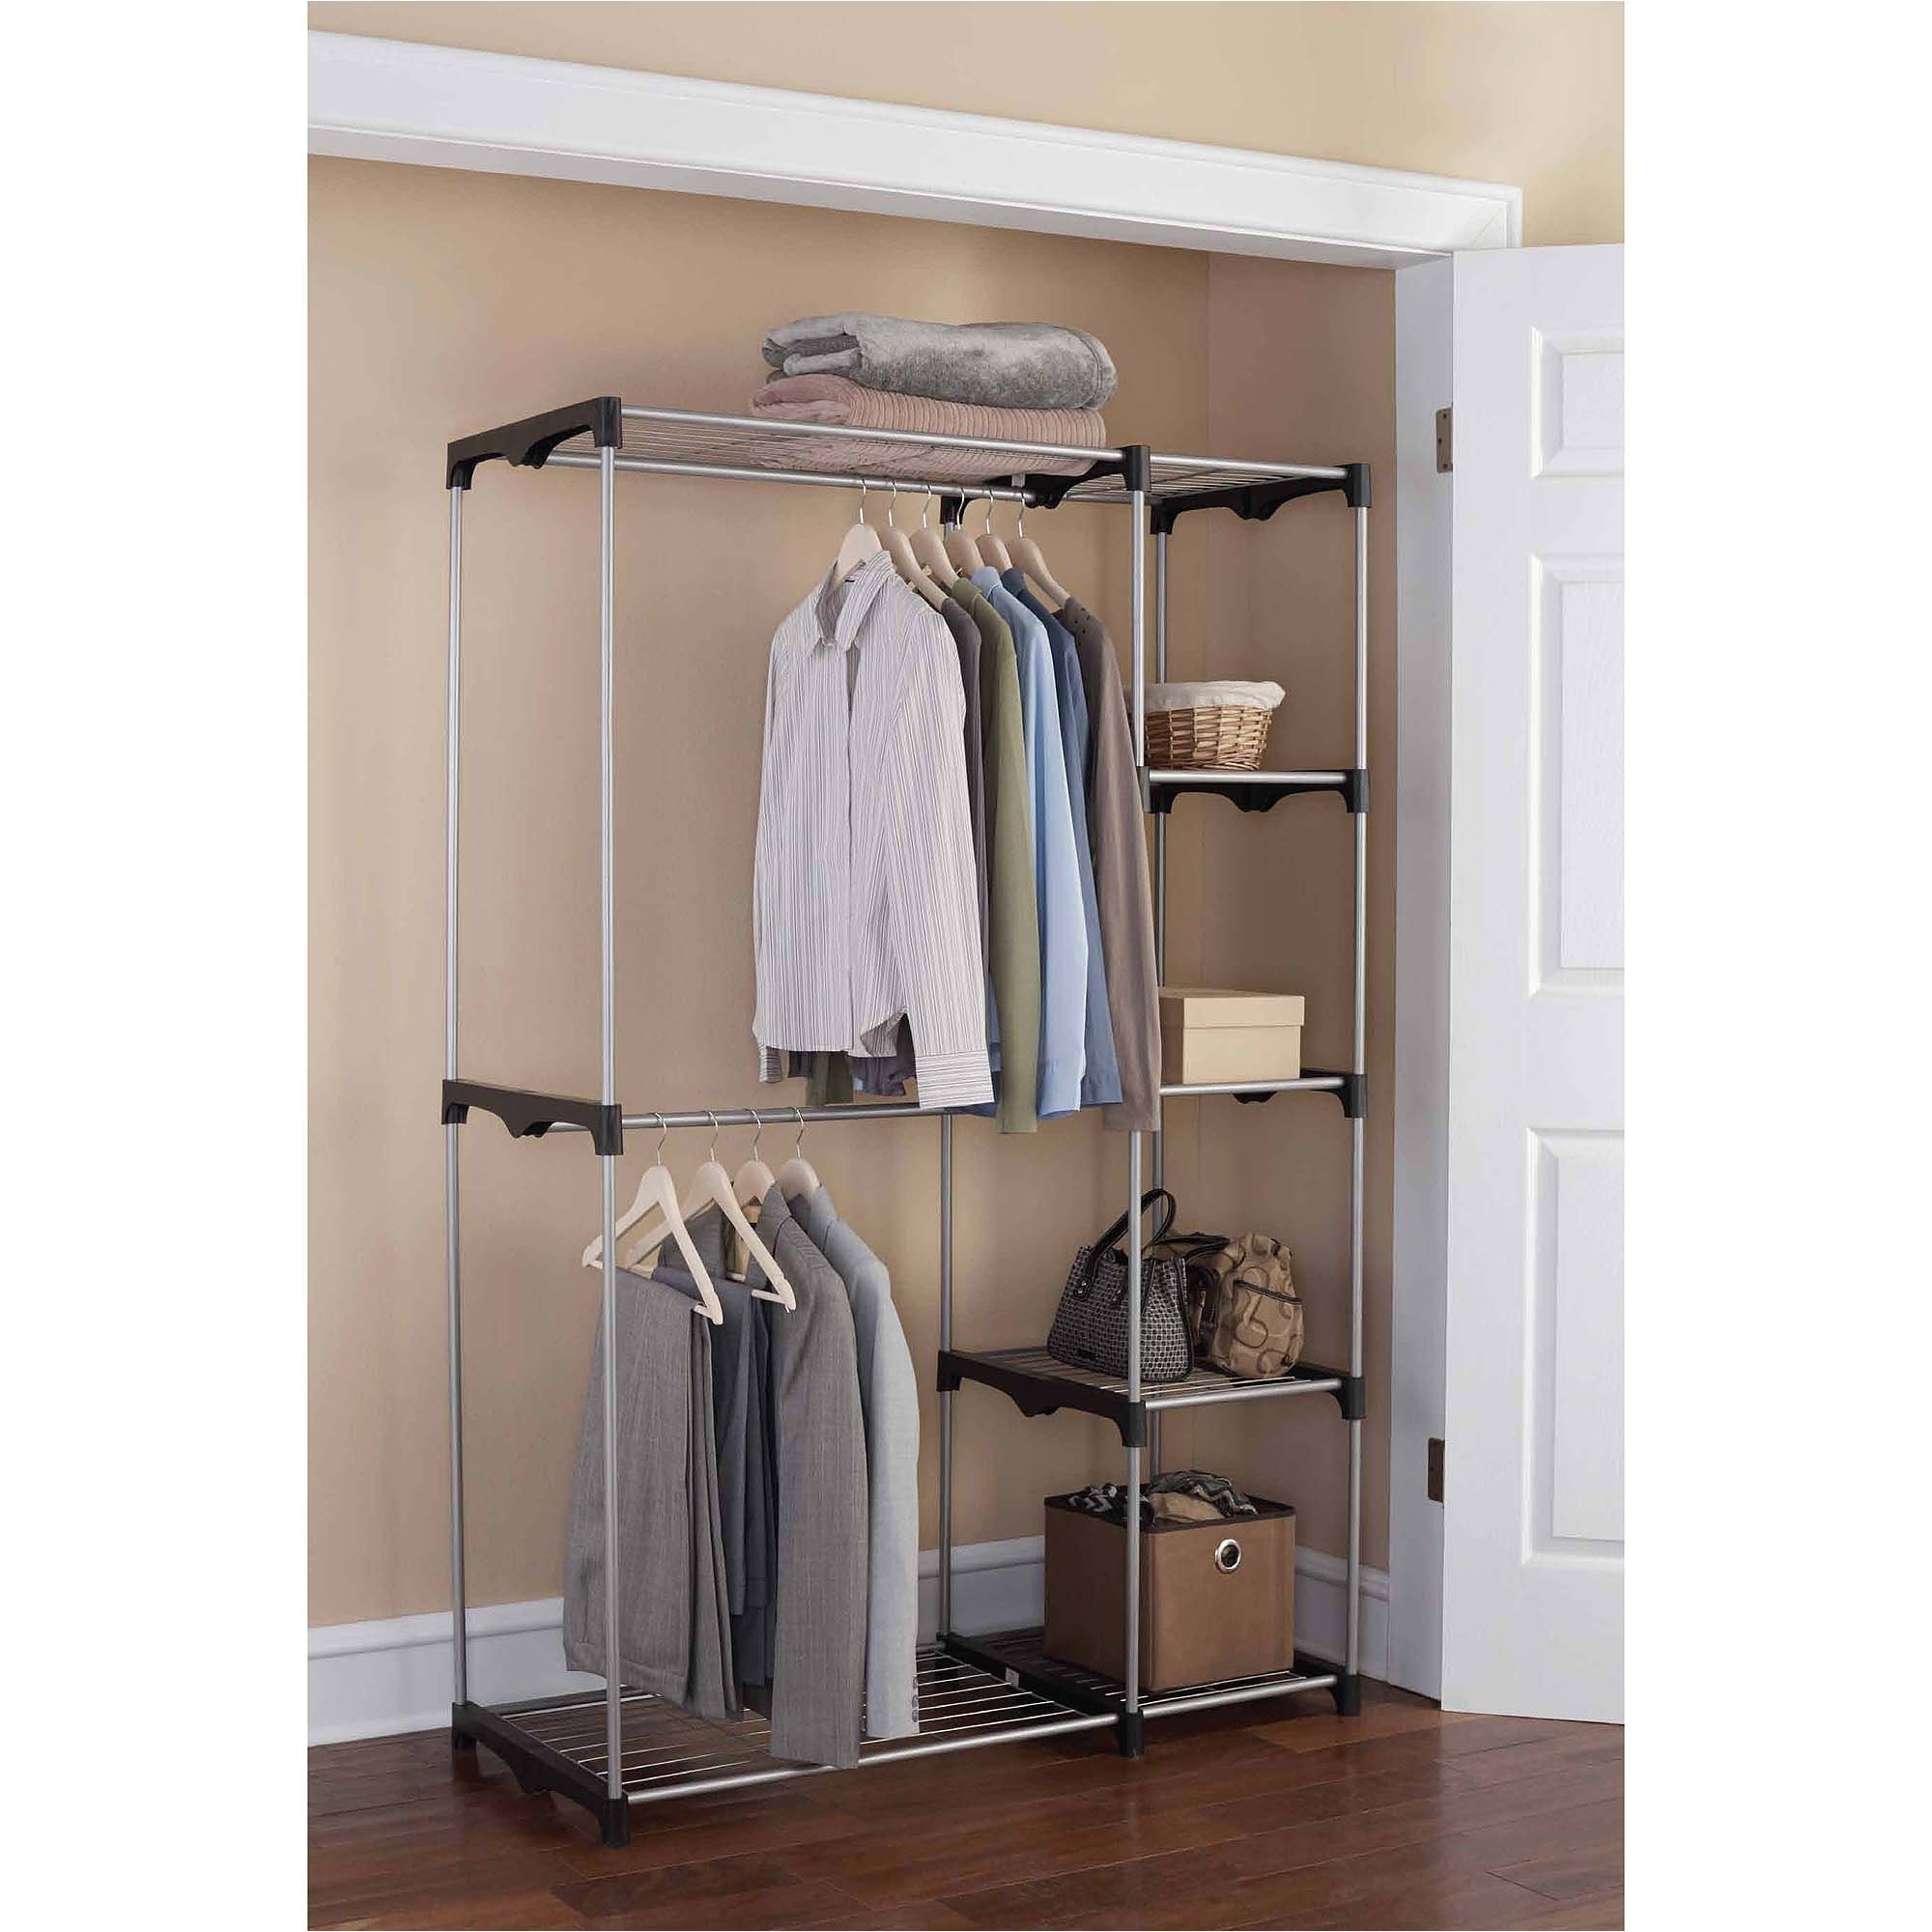 mainstays wire shelf closet organizer 2 tier easy to assemble